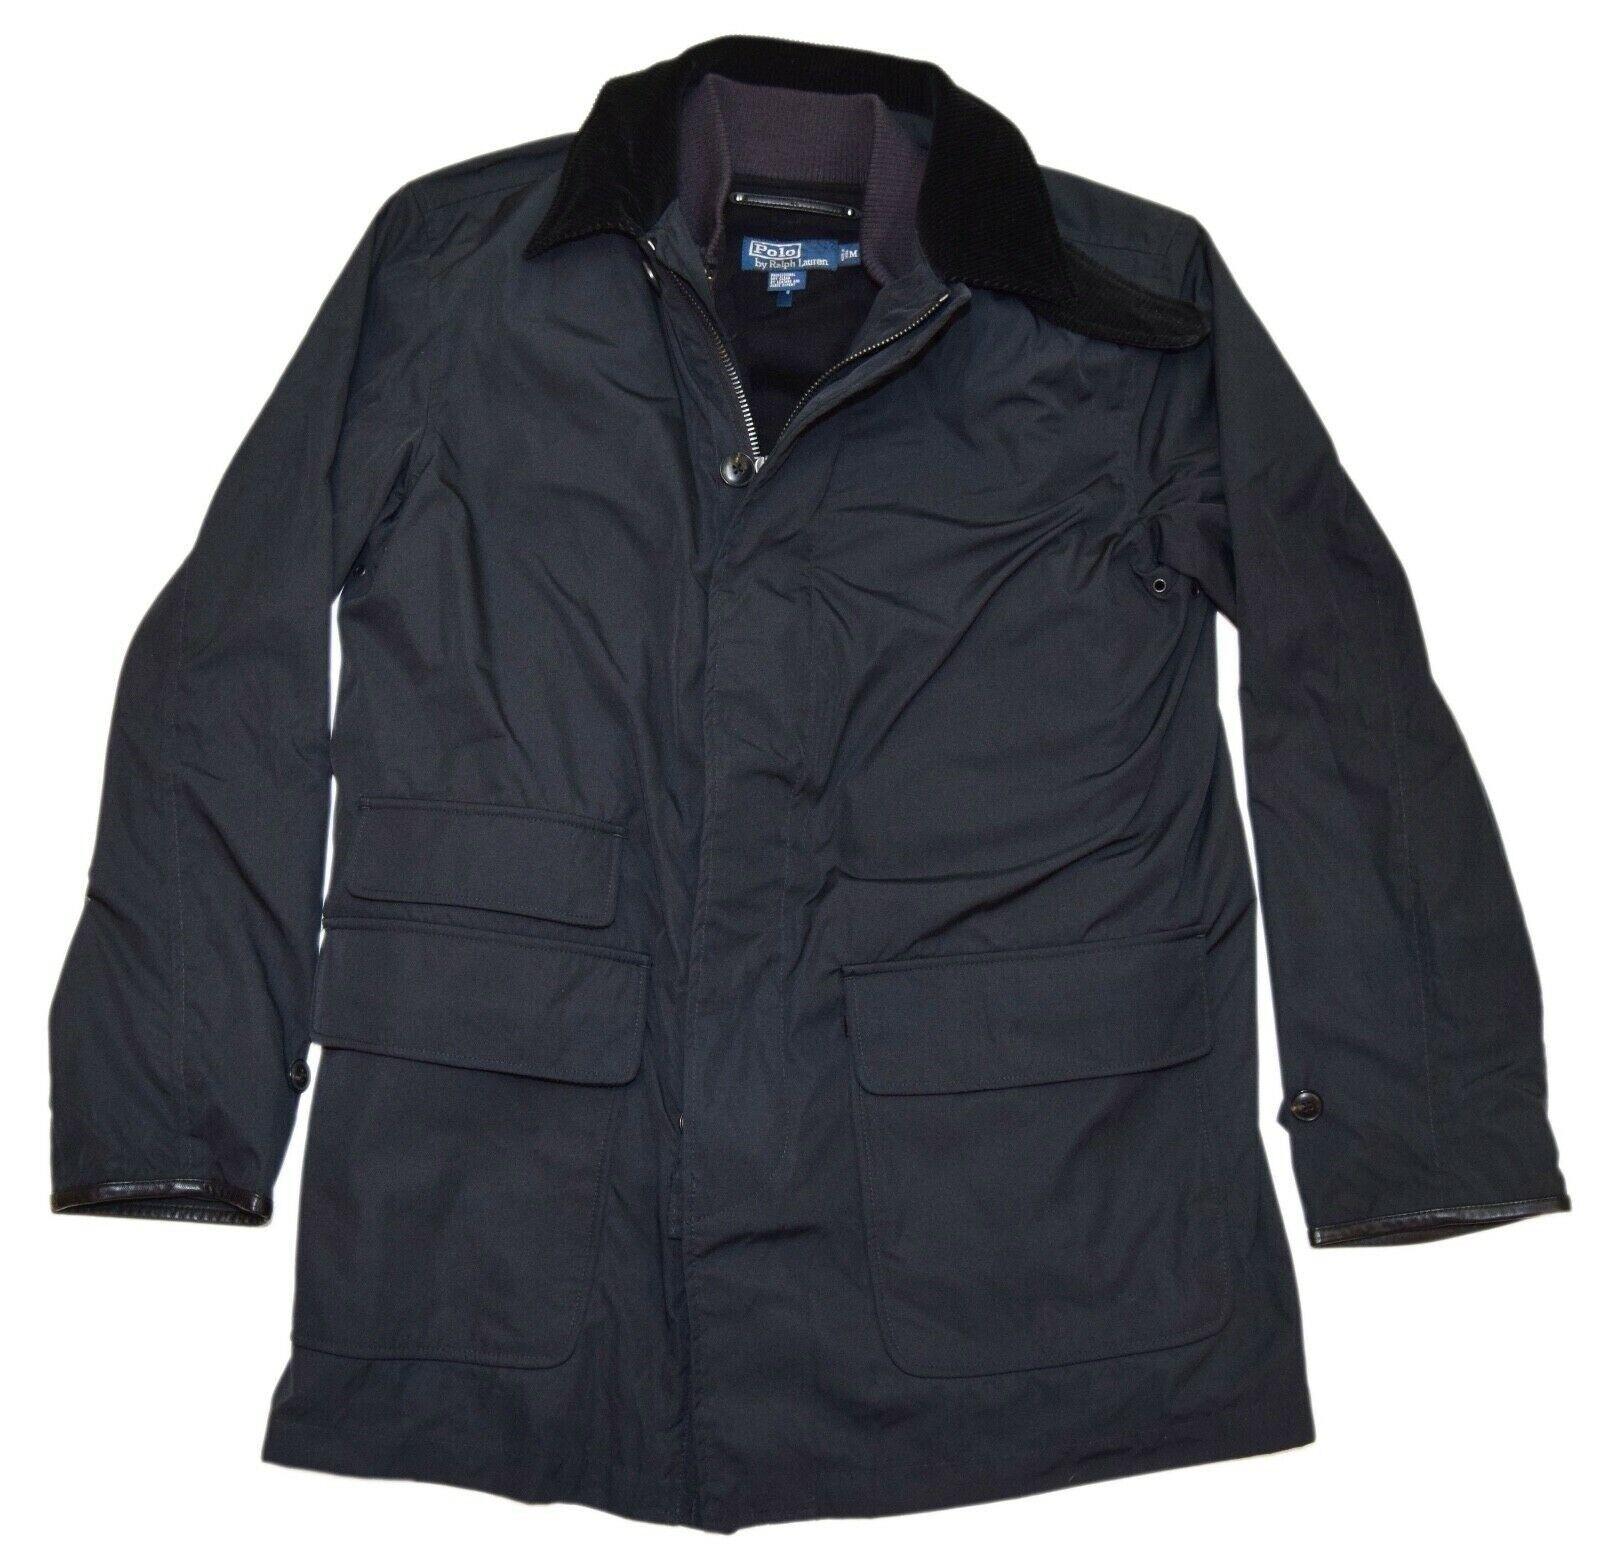 995-polo-ralph-lauren-mens-hooded-3-in-1-parka-coat-jacket-vest-wool-black-xl